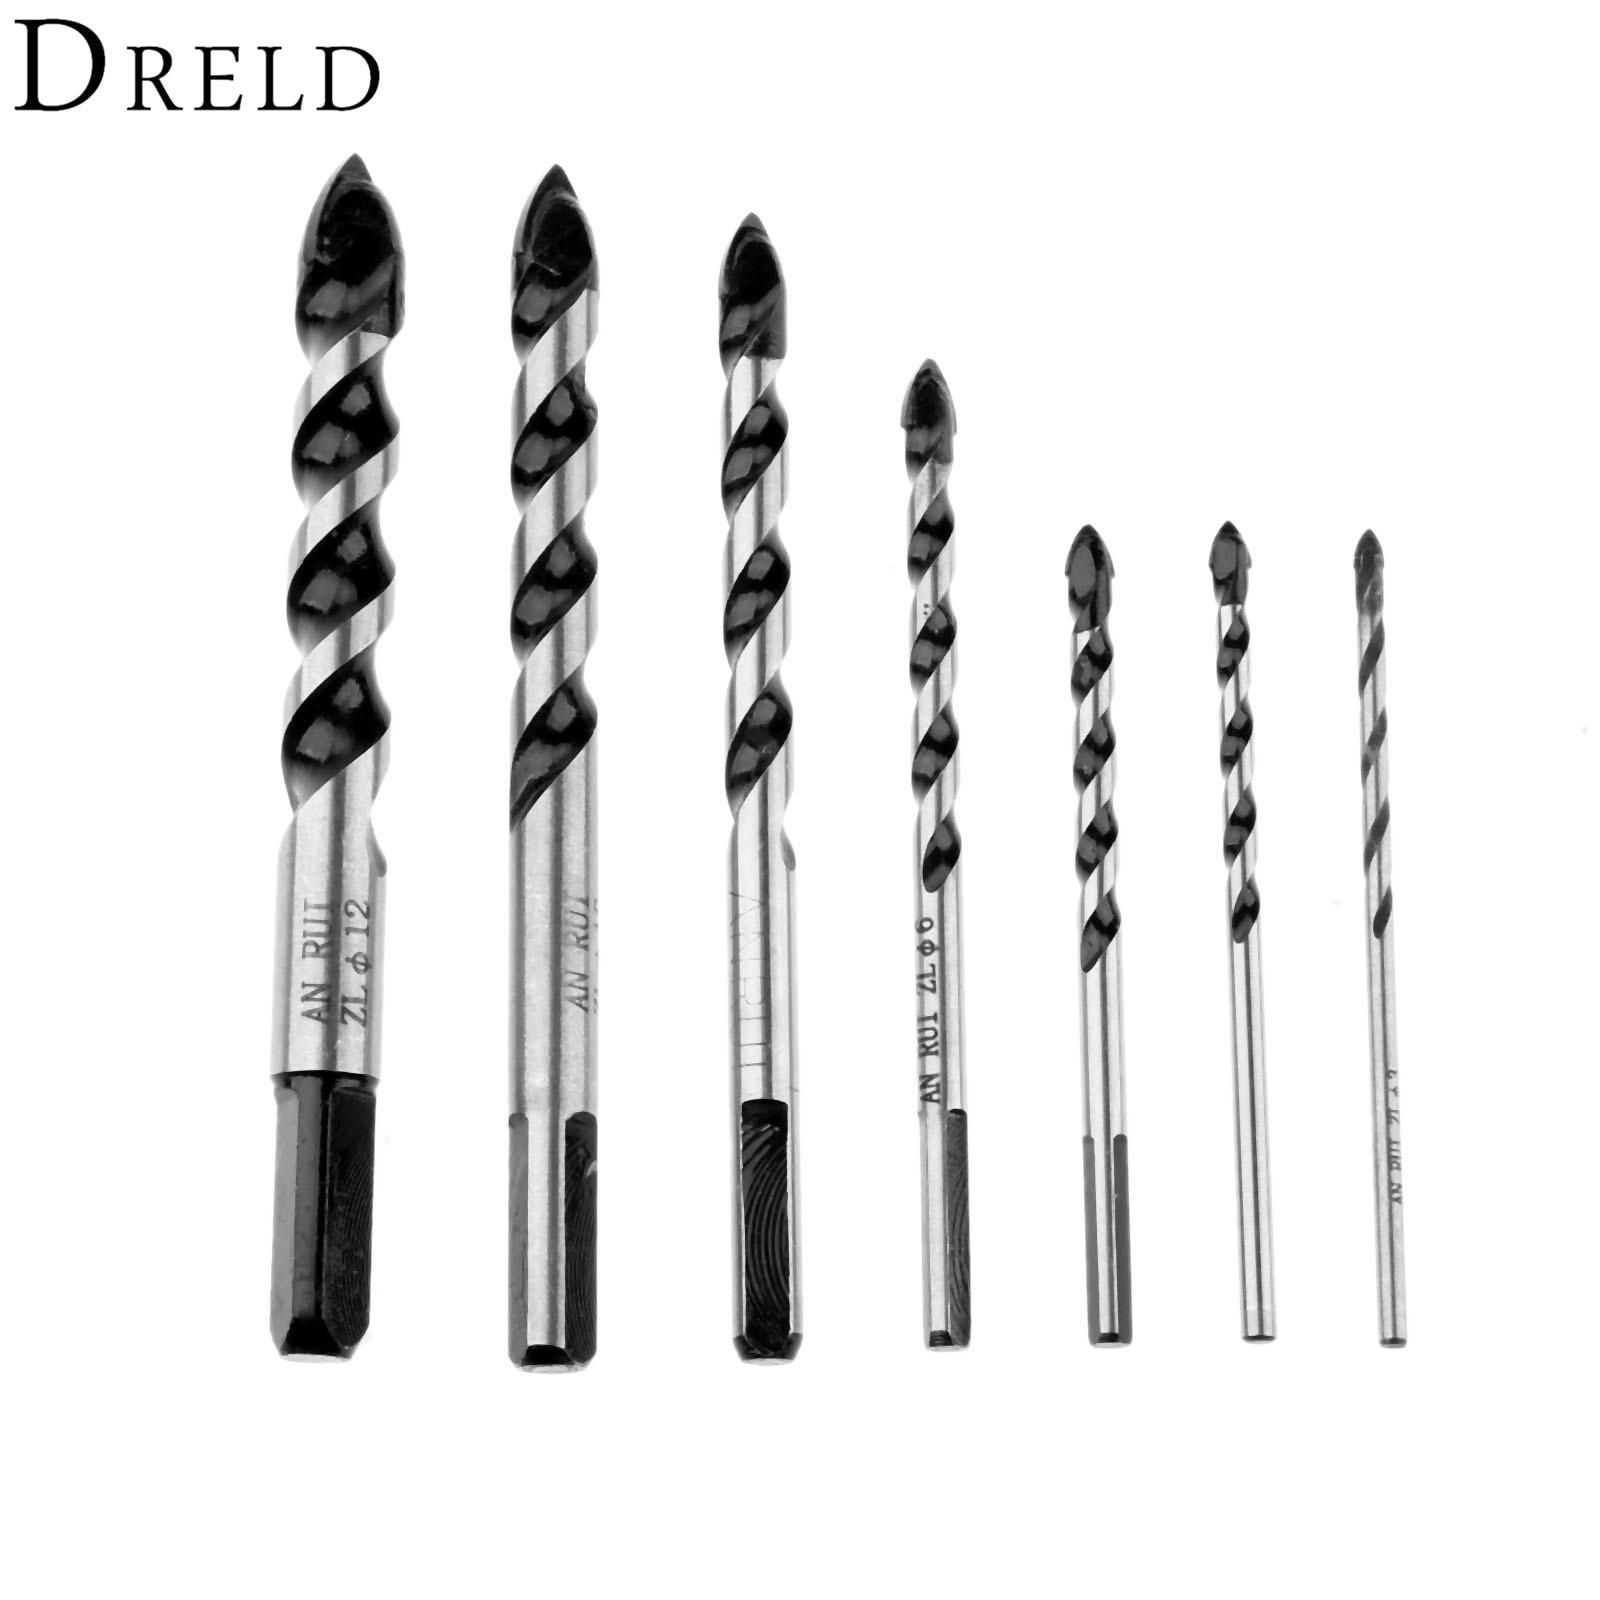 Dreld 1pc 3 12mm Ceramic Drill Bit Steel Alloy Ceramic Glass Porcelain Marble Granite Cutting